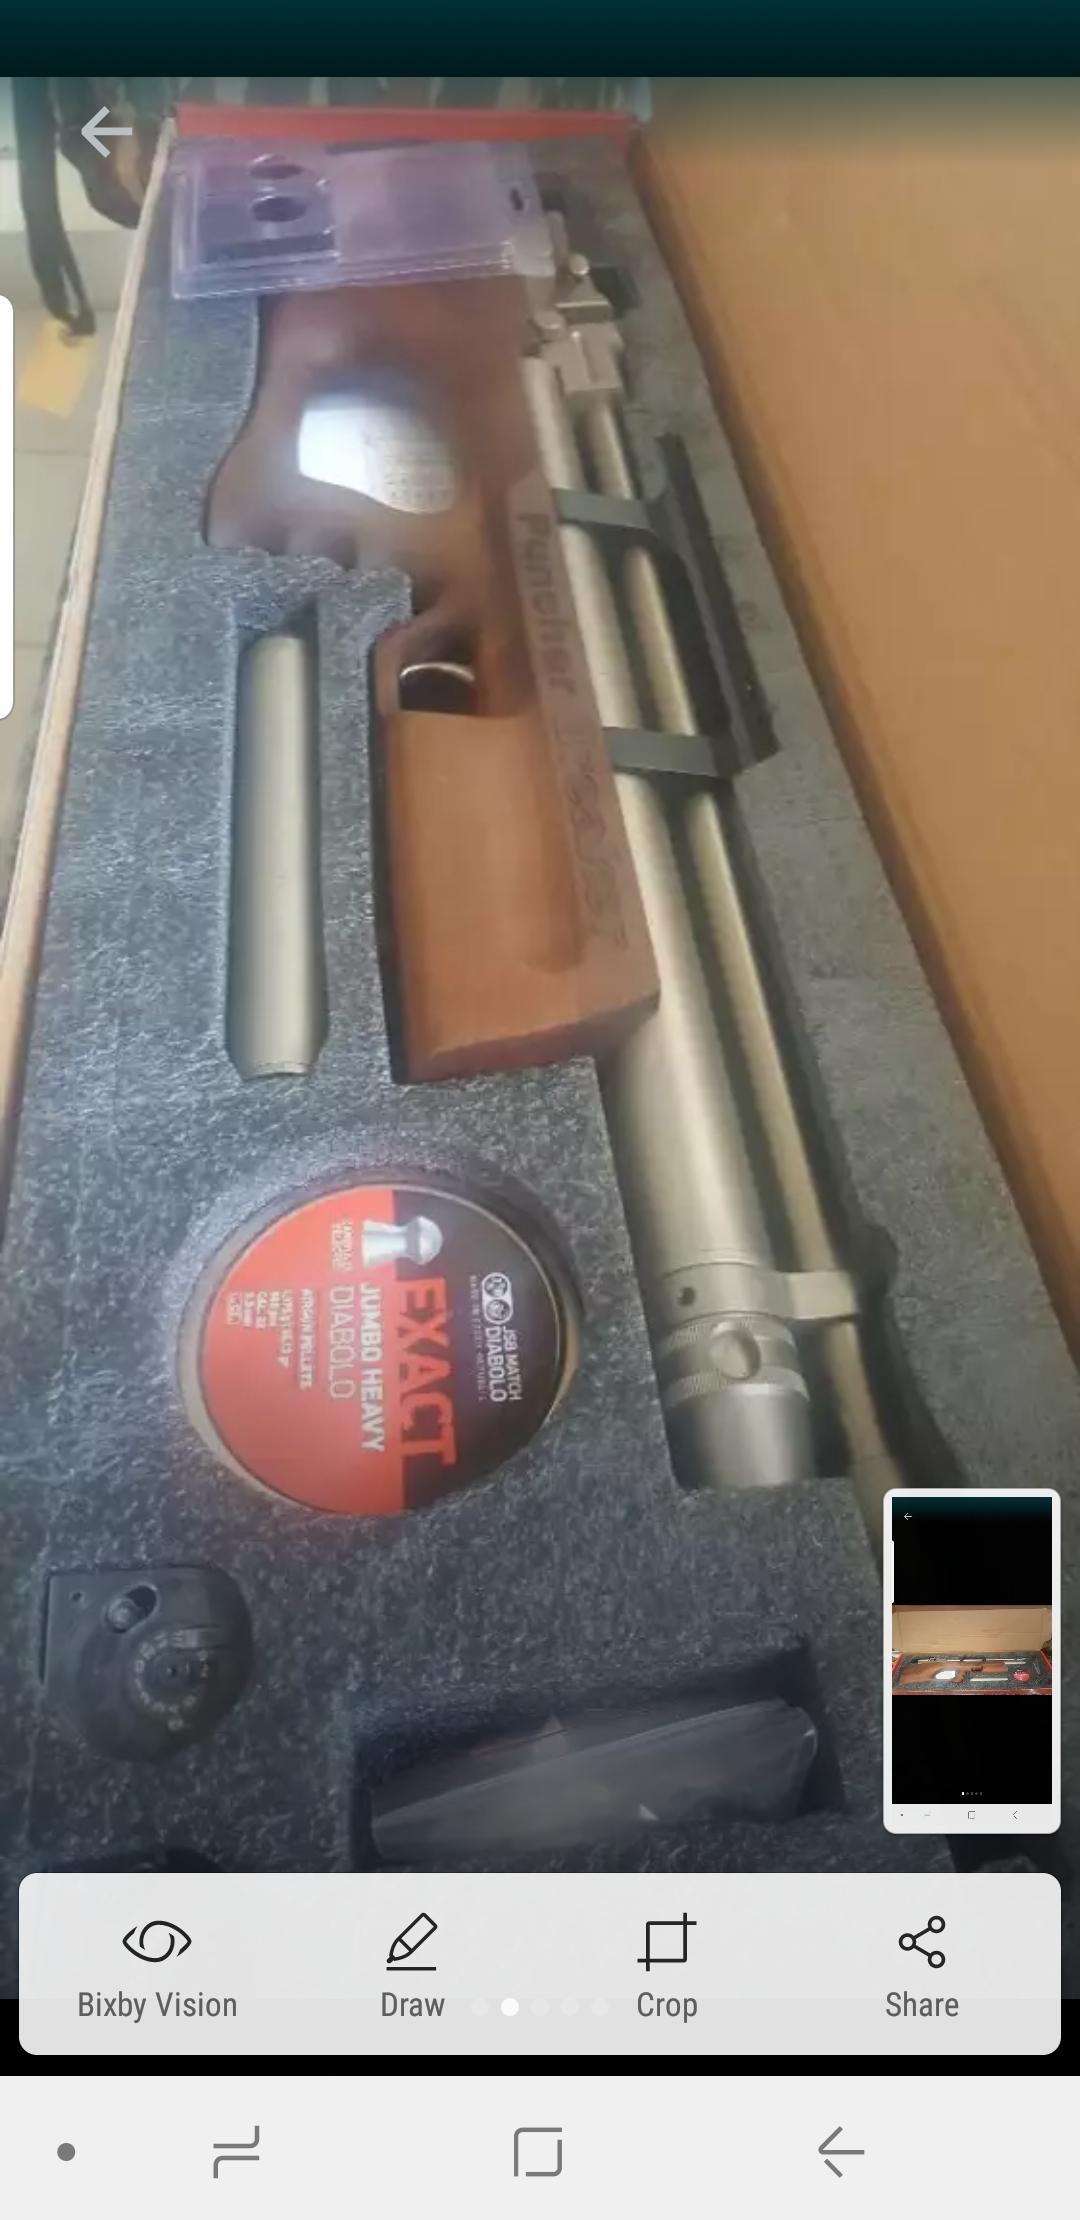 Kral Arms Puncher Breaker  22 | Junk Mail